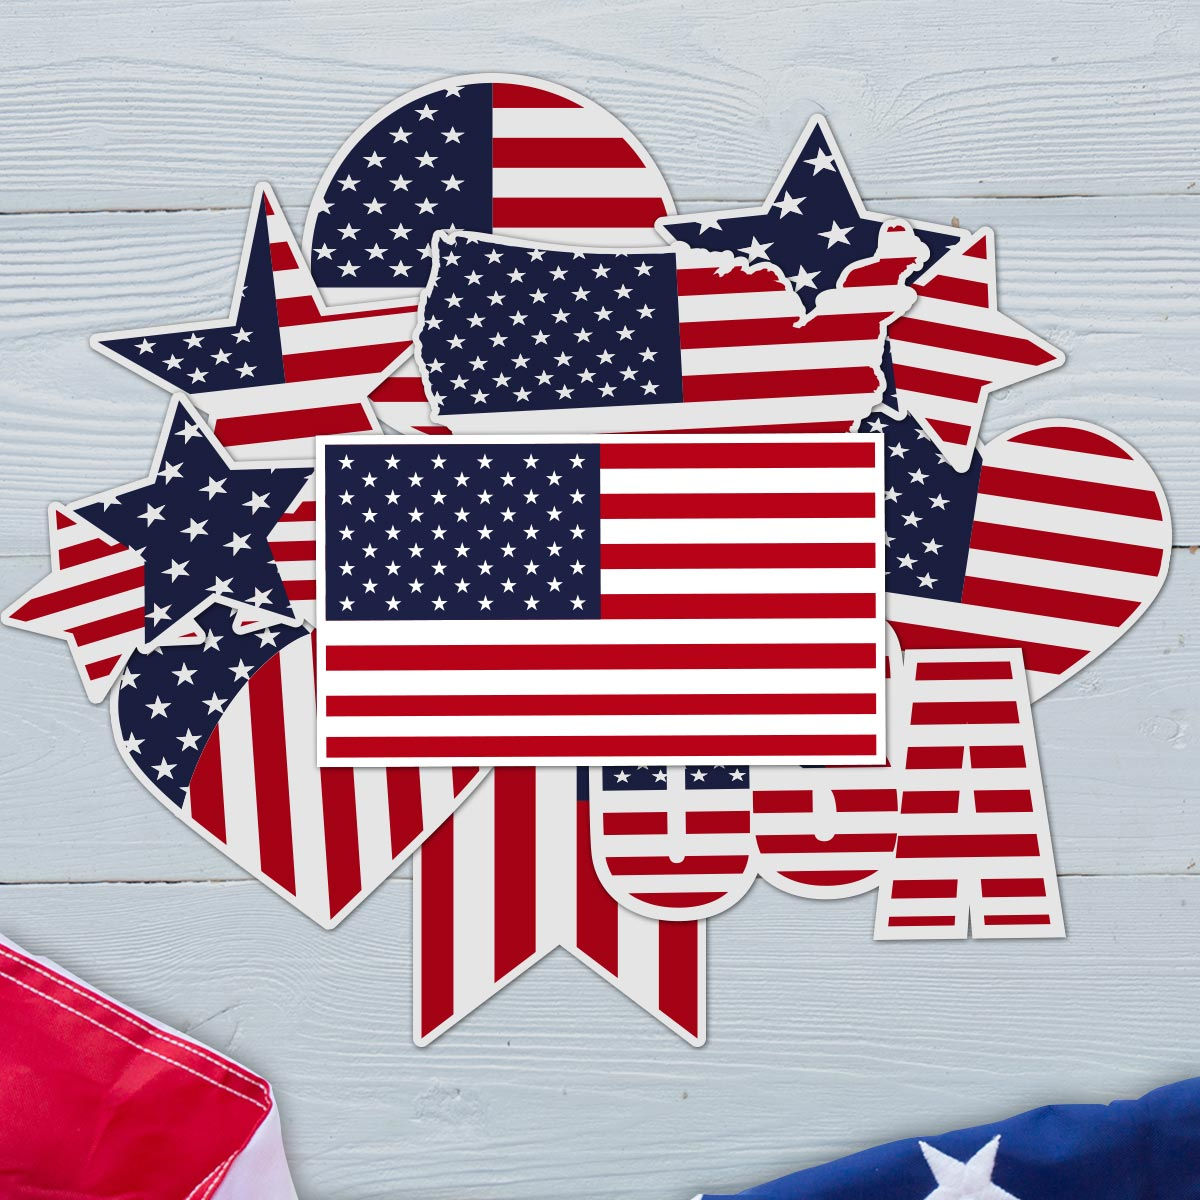 Stars and Stripes - USA Flag Sticker Bundle 2